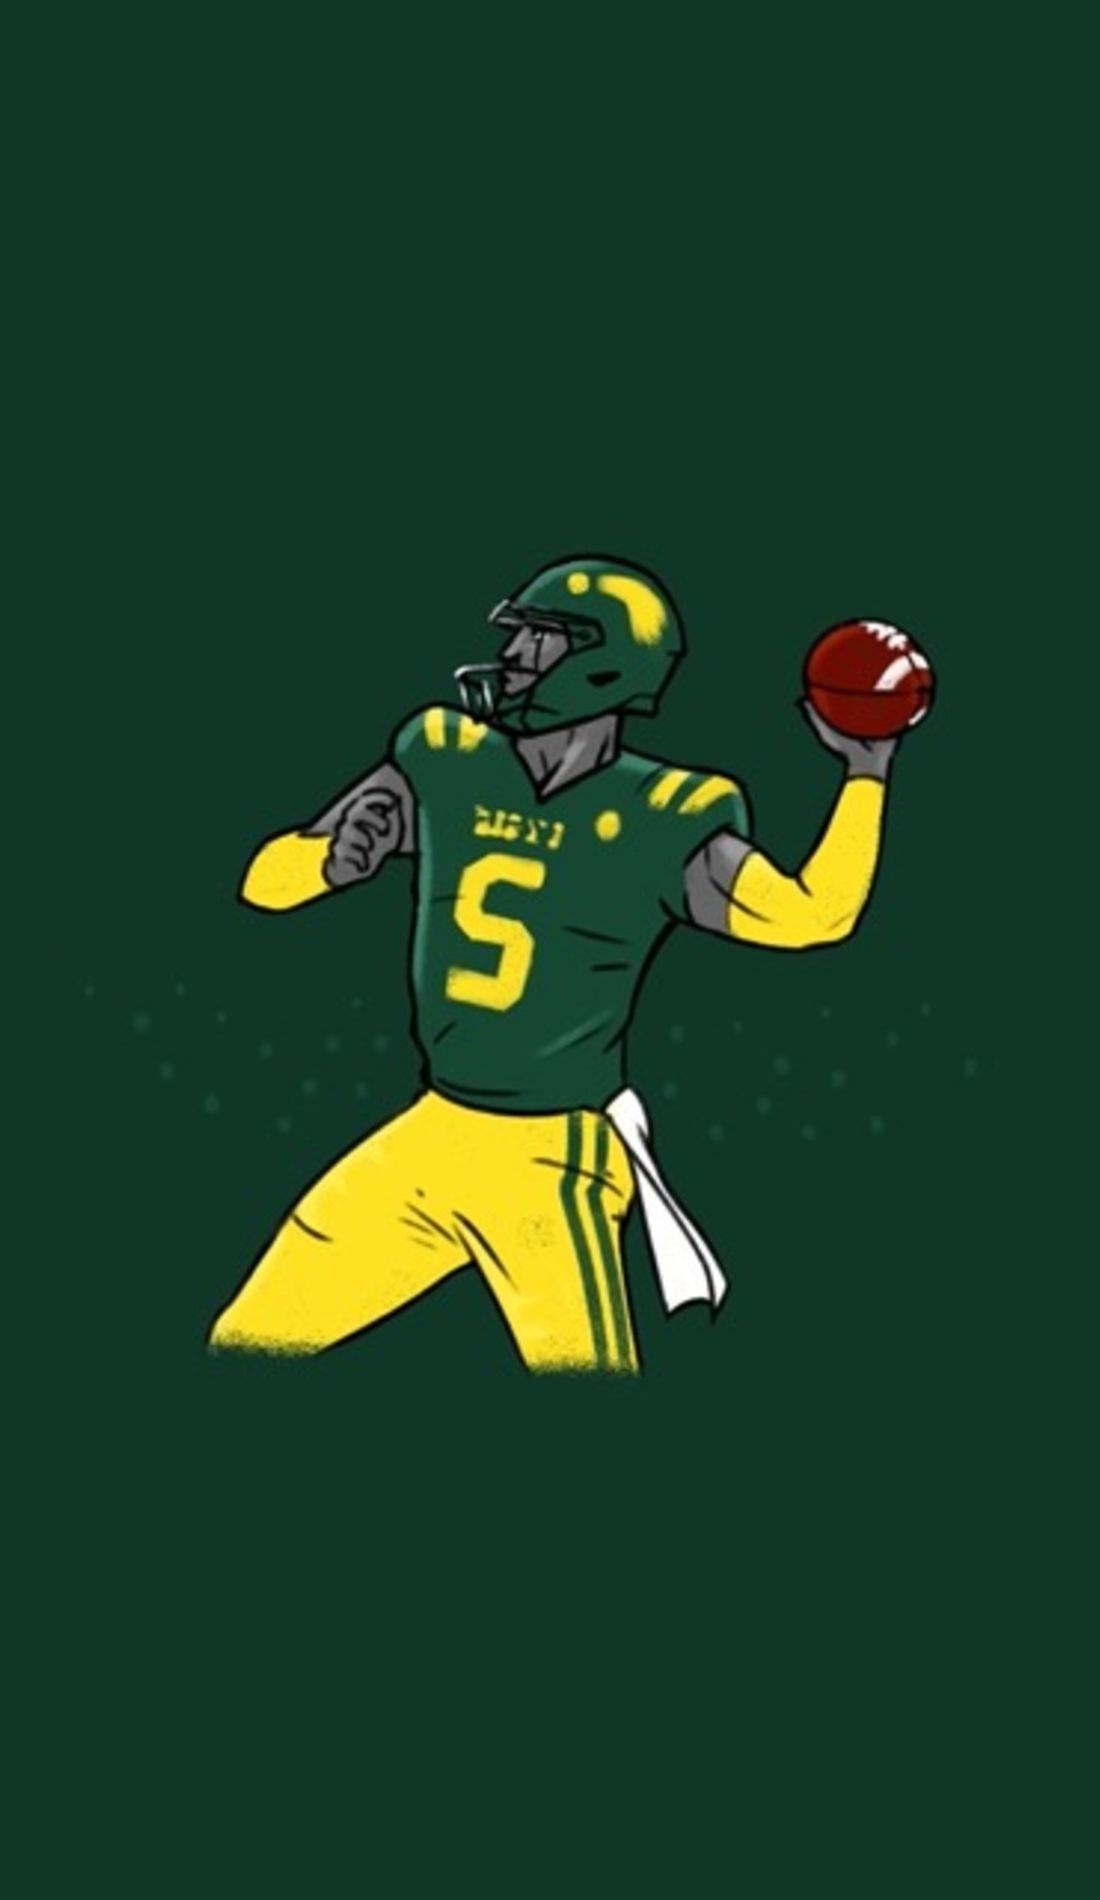 A Oregon Ducks Football live event